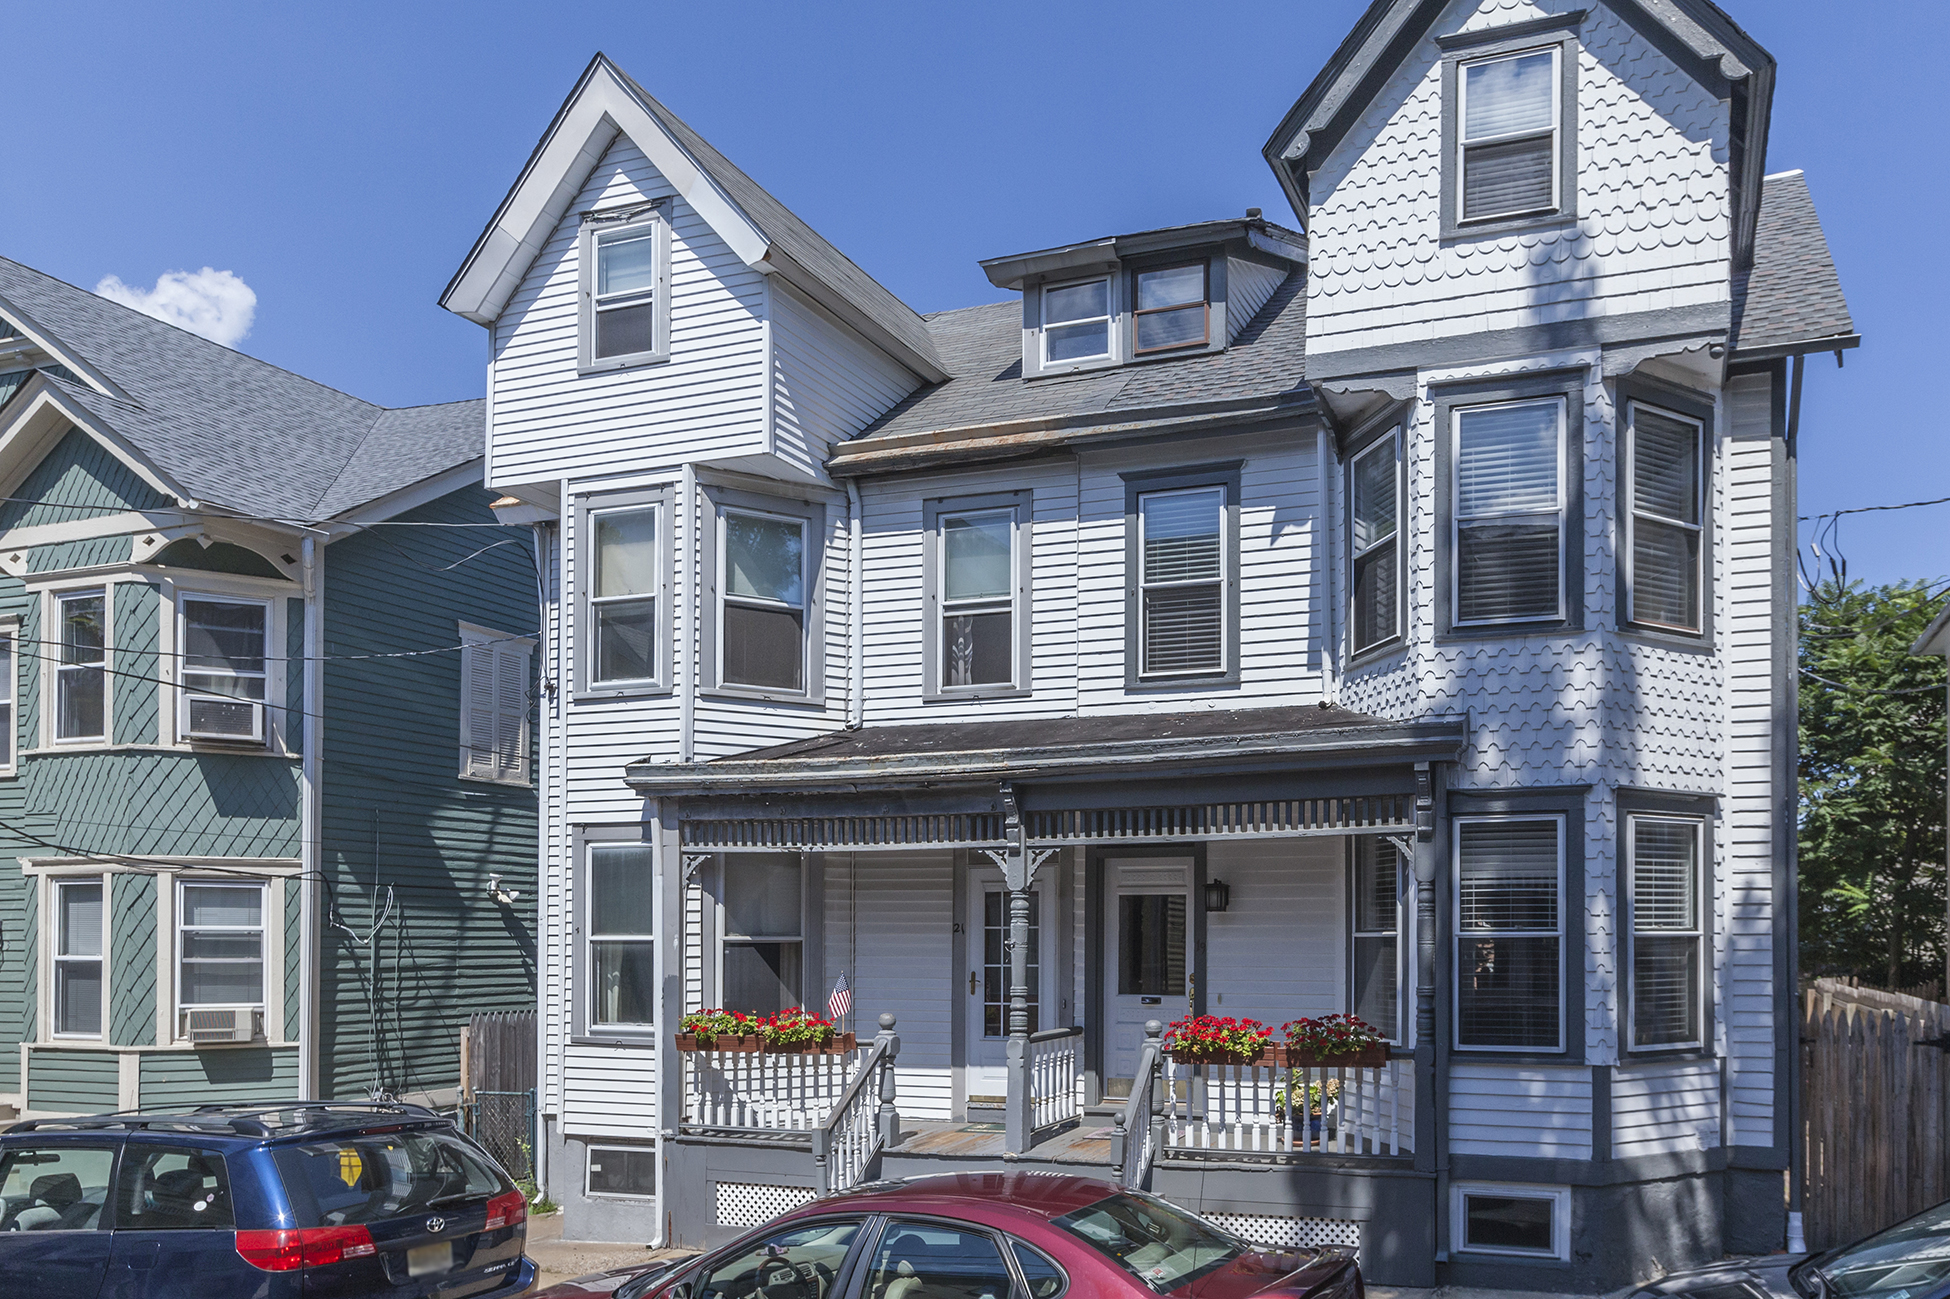 Residência urbana para Venda às A Classic Early 1900s Home 21 Bank Street Princeton, Nova Jersey 08540 Estados Unidos